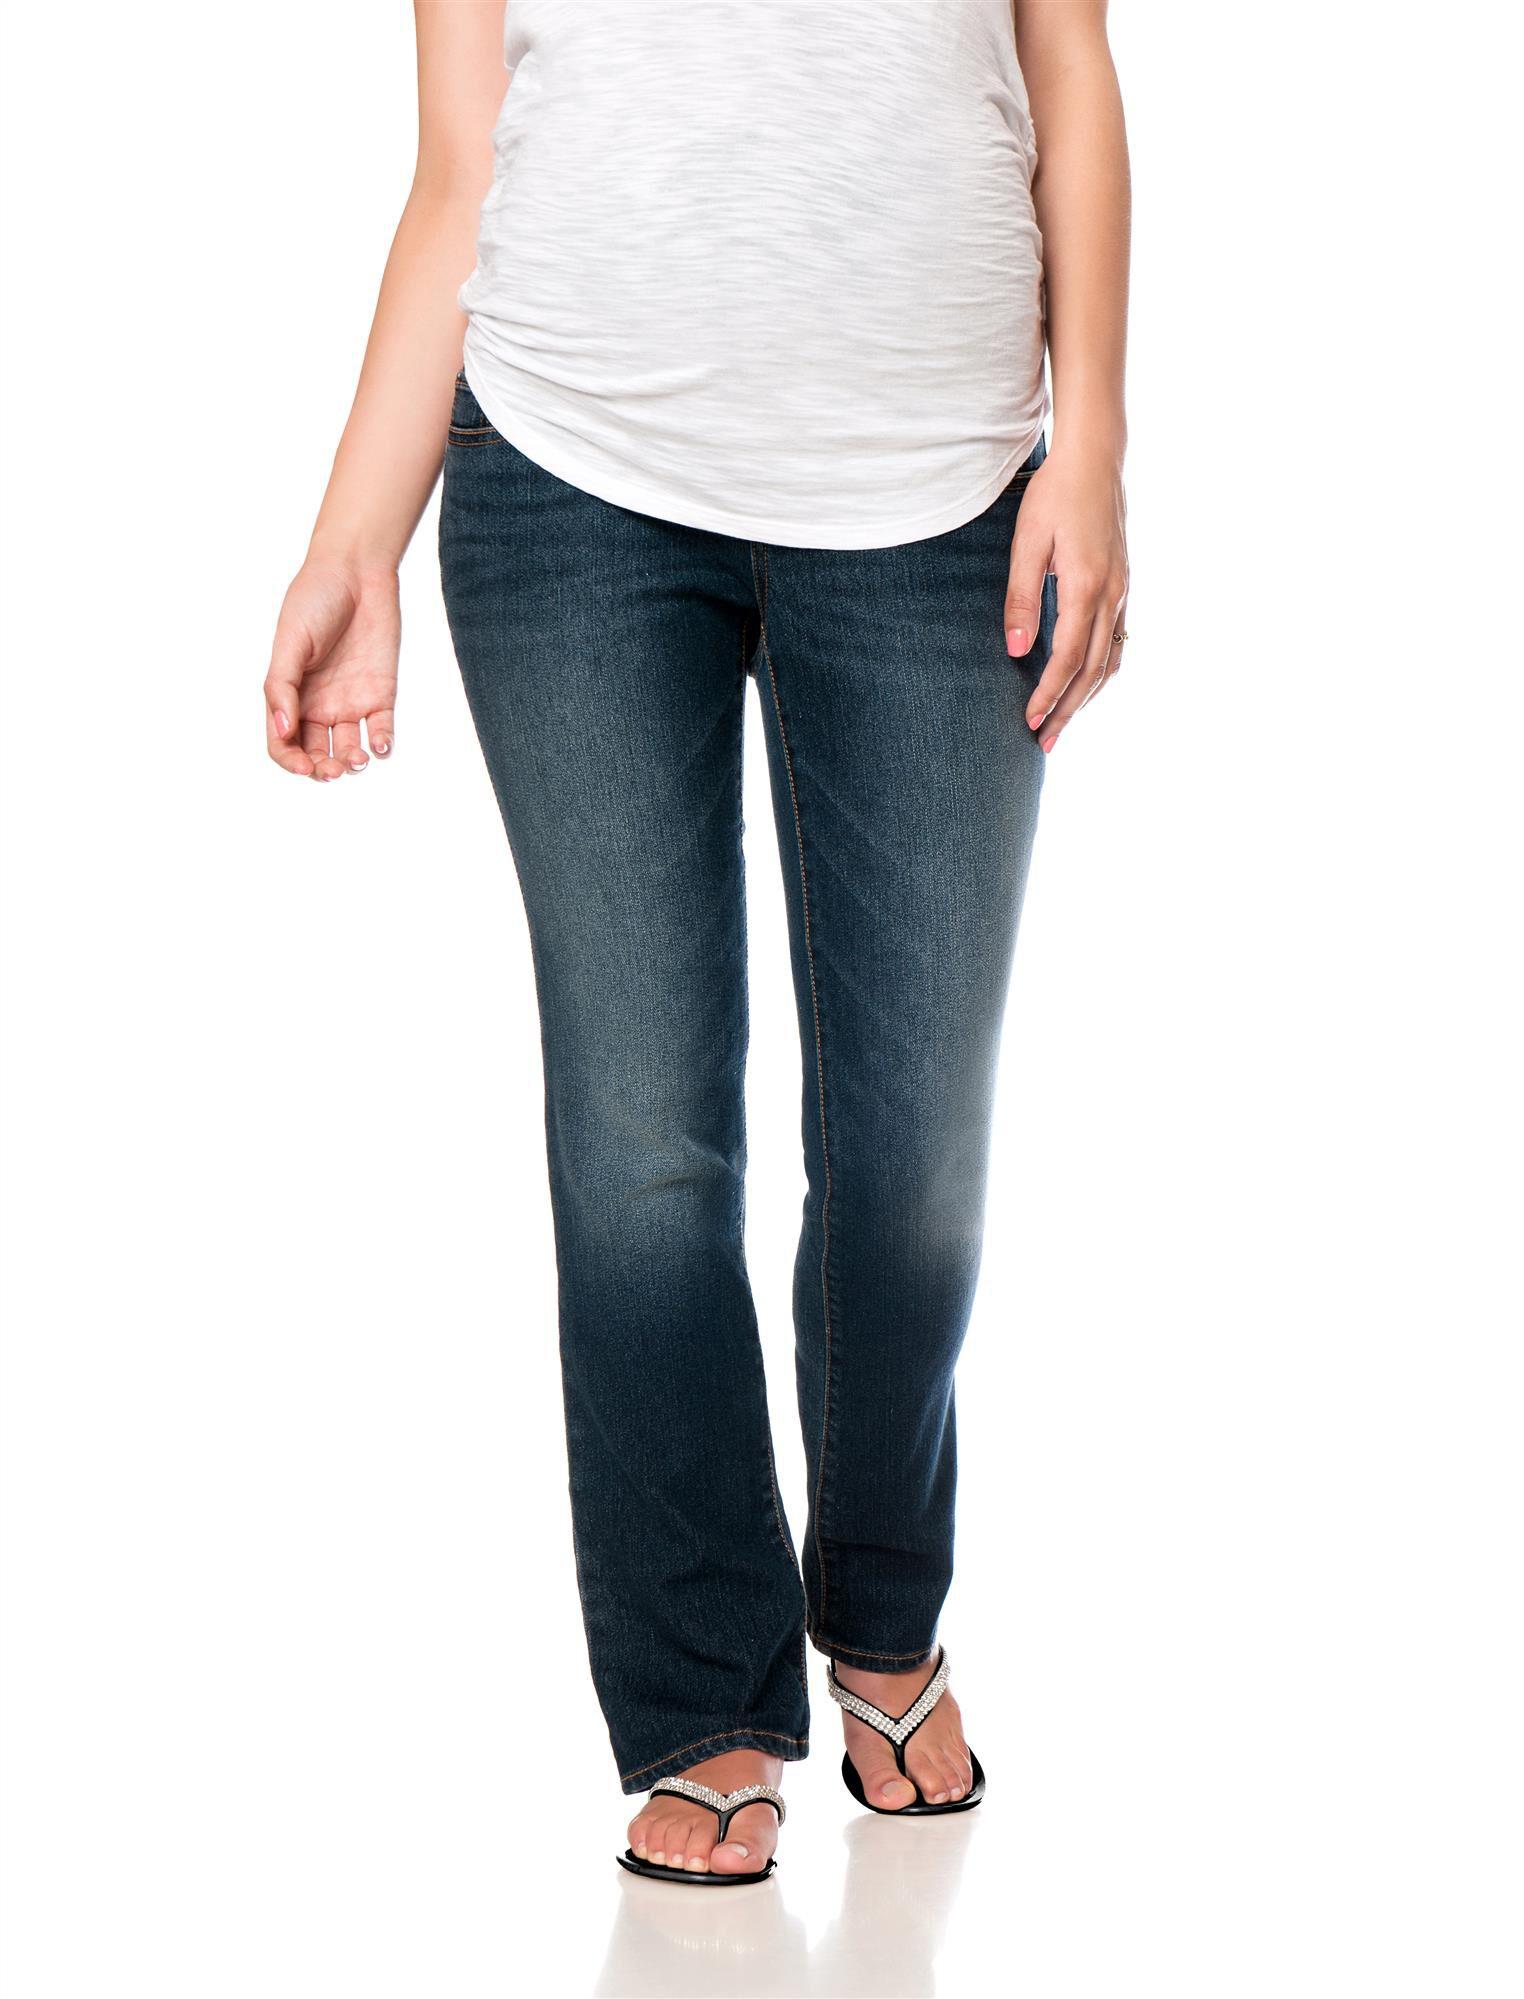 Motherhood Indigo Blue Petite Skinny Boot Maternity Jeans